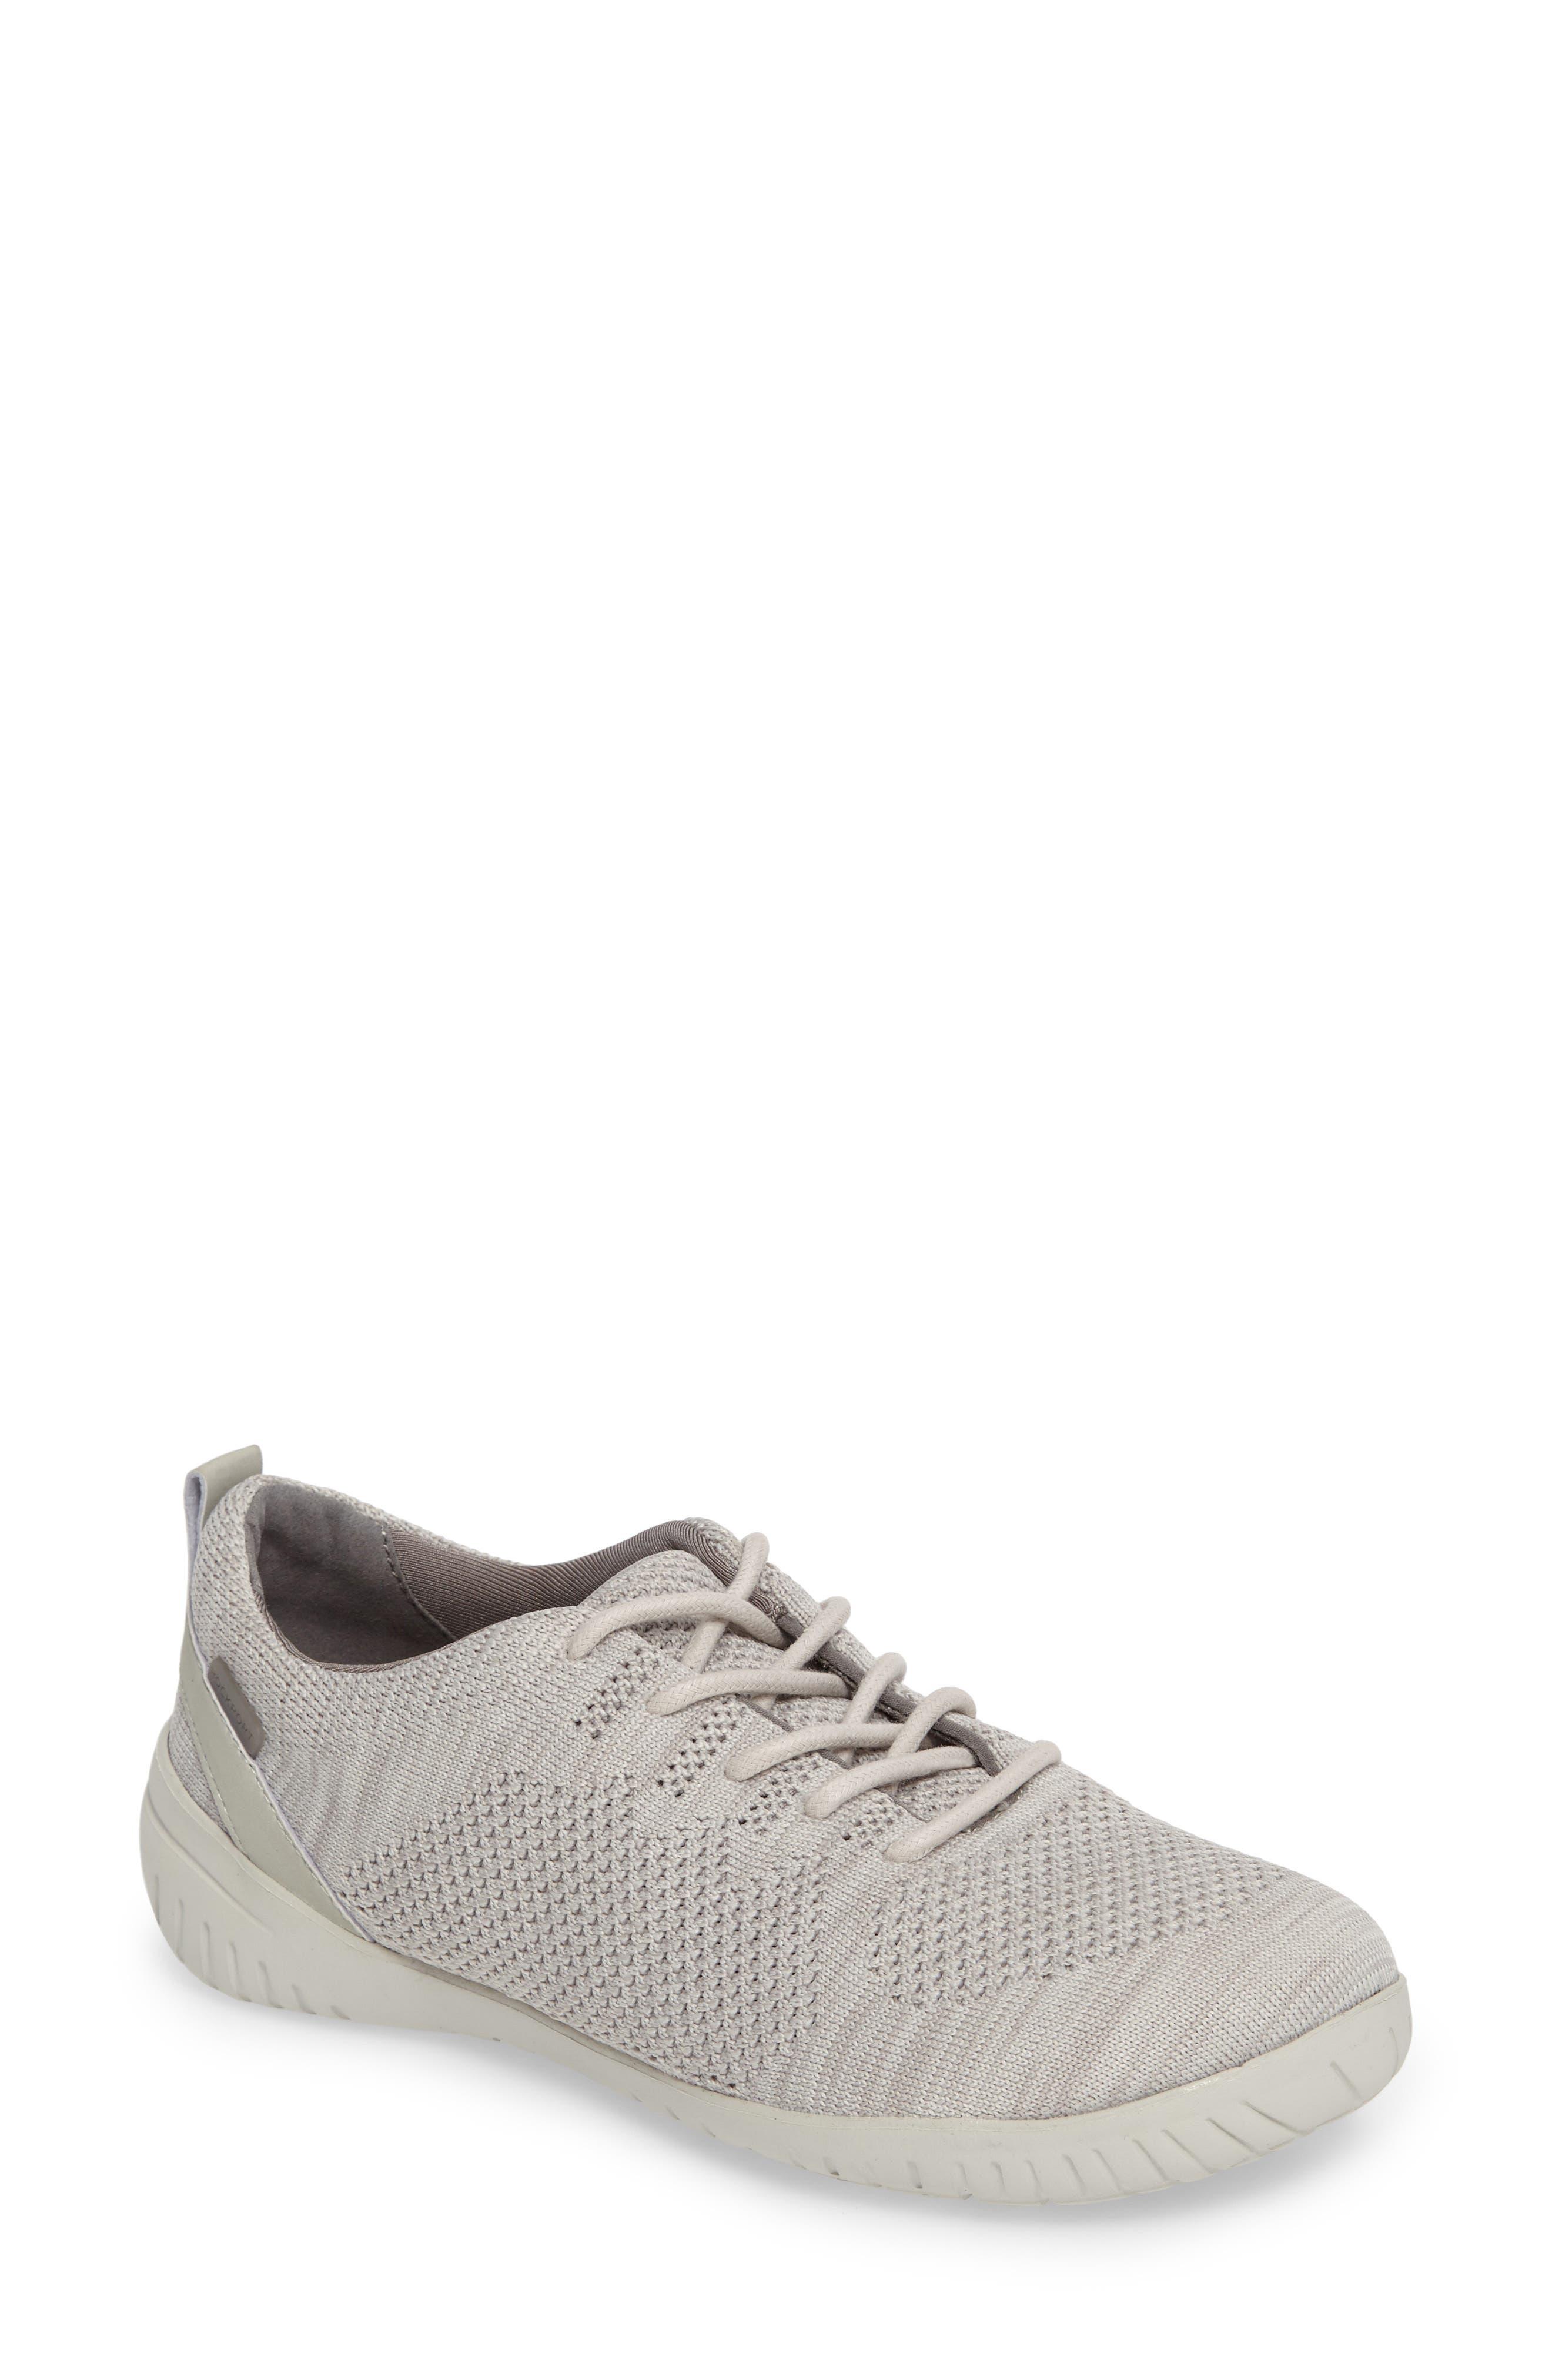 Alternate Image 1 Selected - Rockport Raelyn Knit Sneaker (Women)